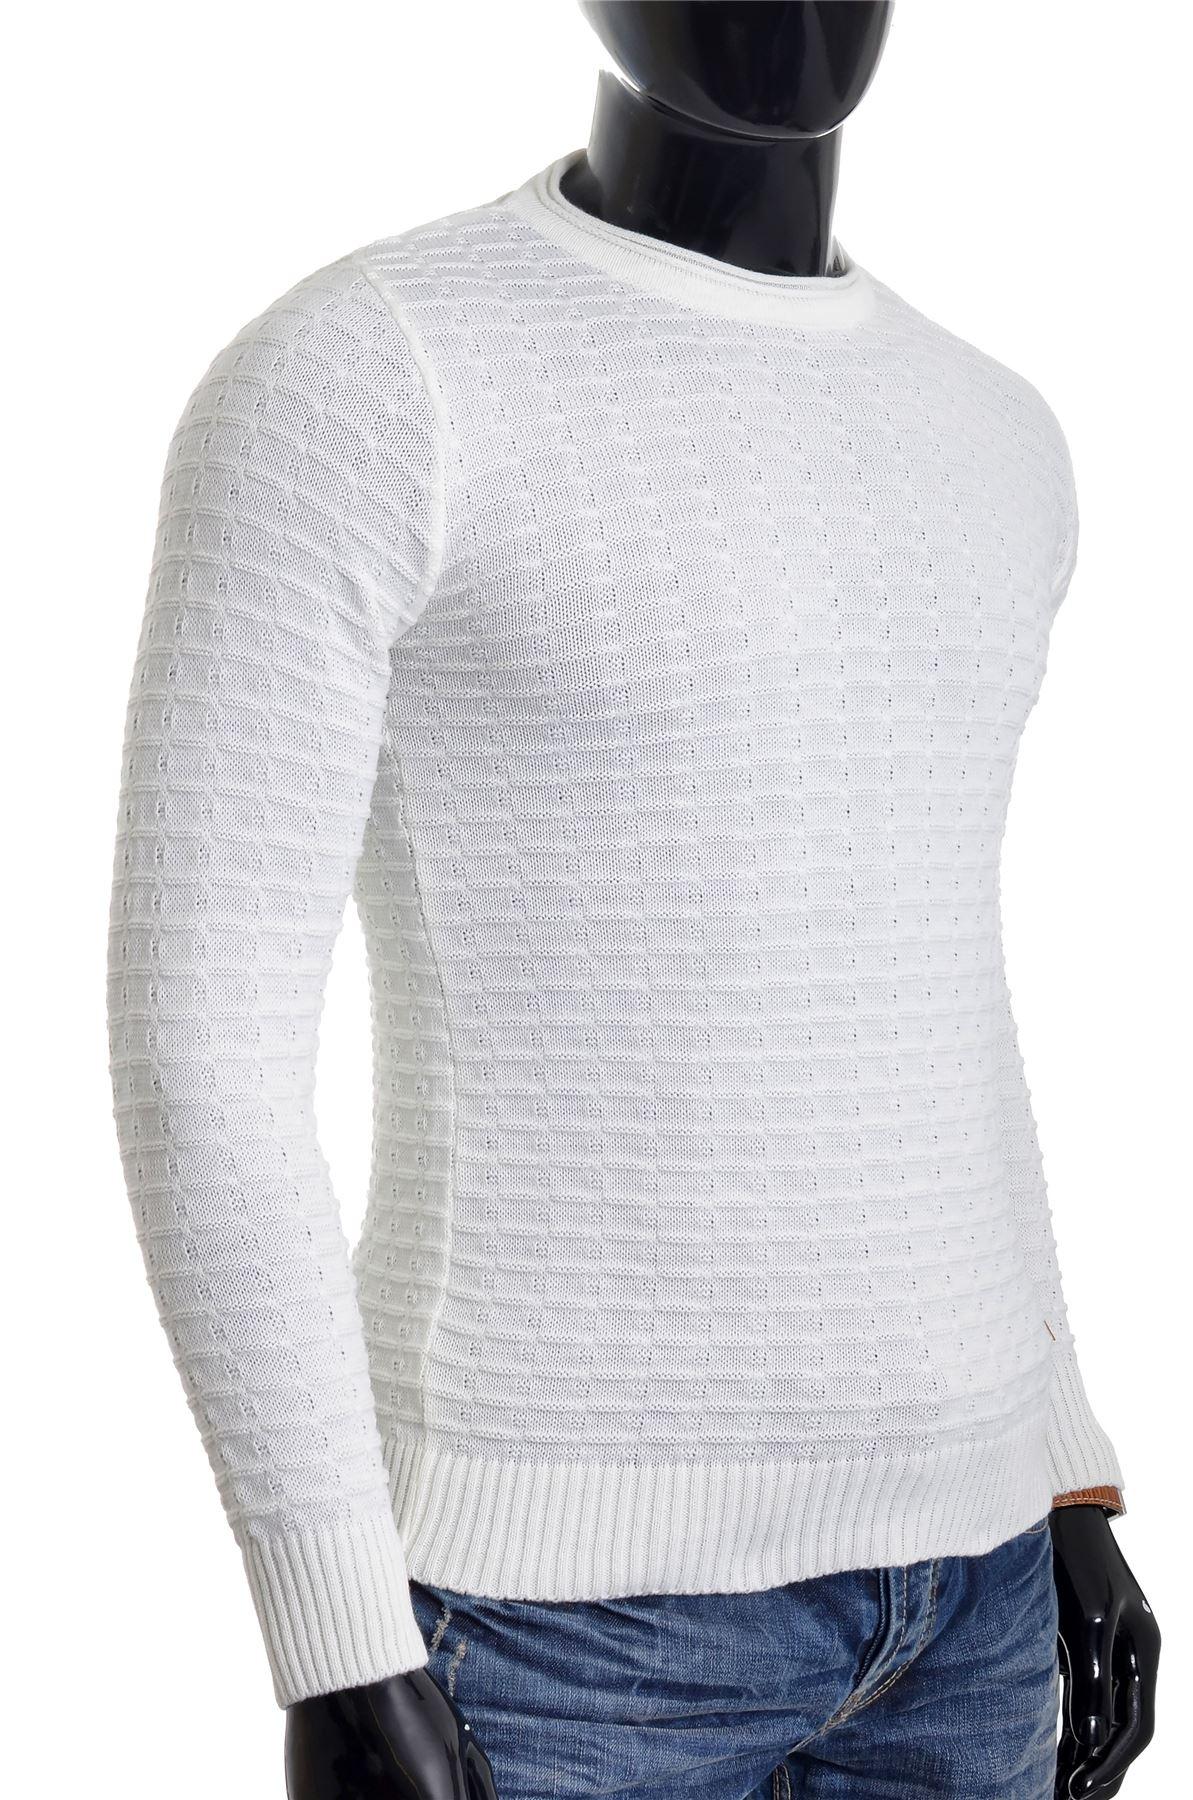 Men-039-s-Jumper-Striped-Knit-Smart-Long-Sleeve-Sweater-Crew-Neck-Top-Slim-Fitness thumbnail 14